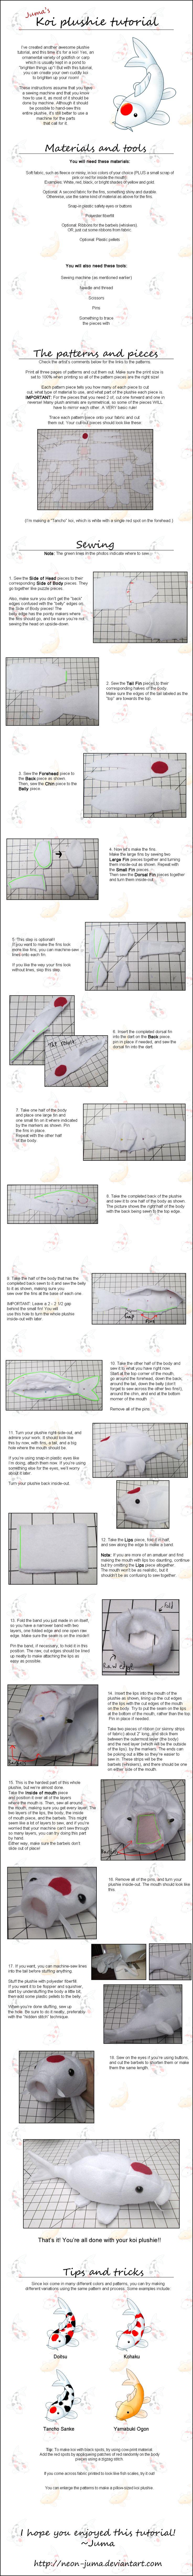 Koi plushie tutorial by Neon-Juma on DeviantArt